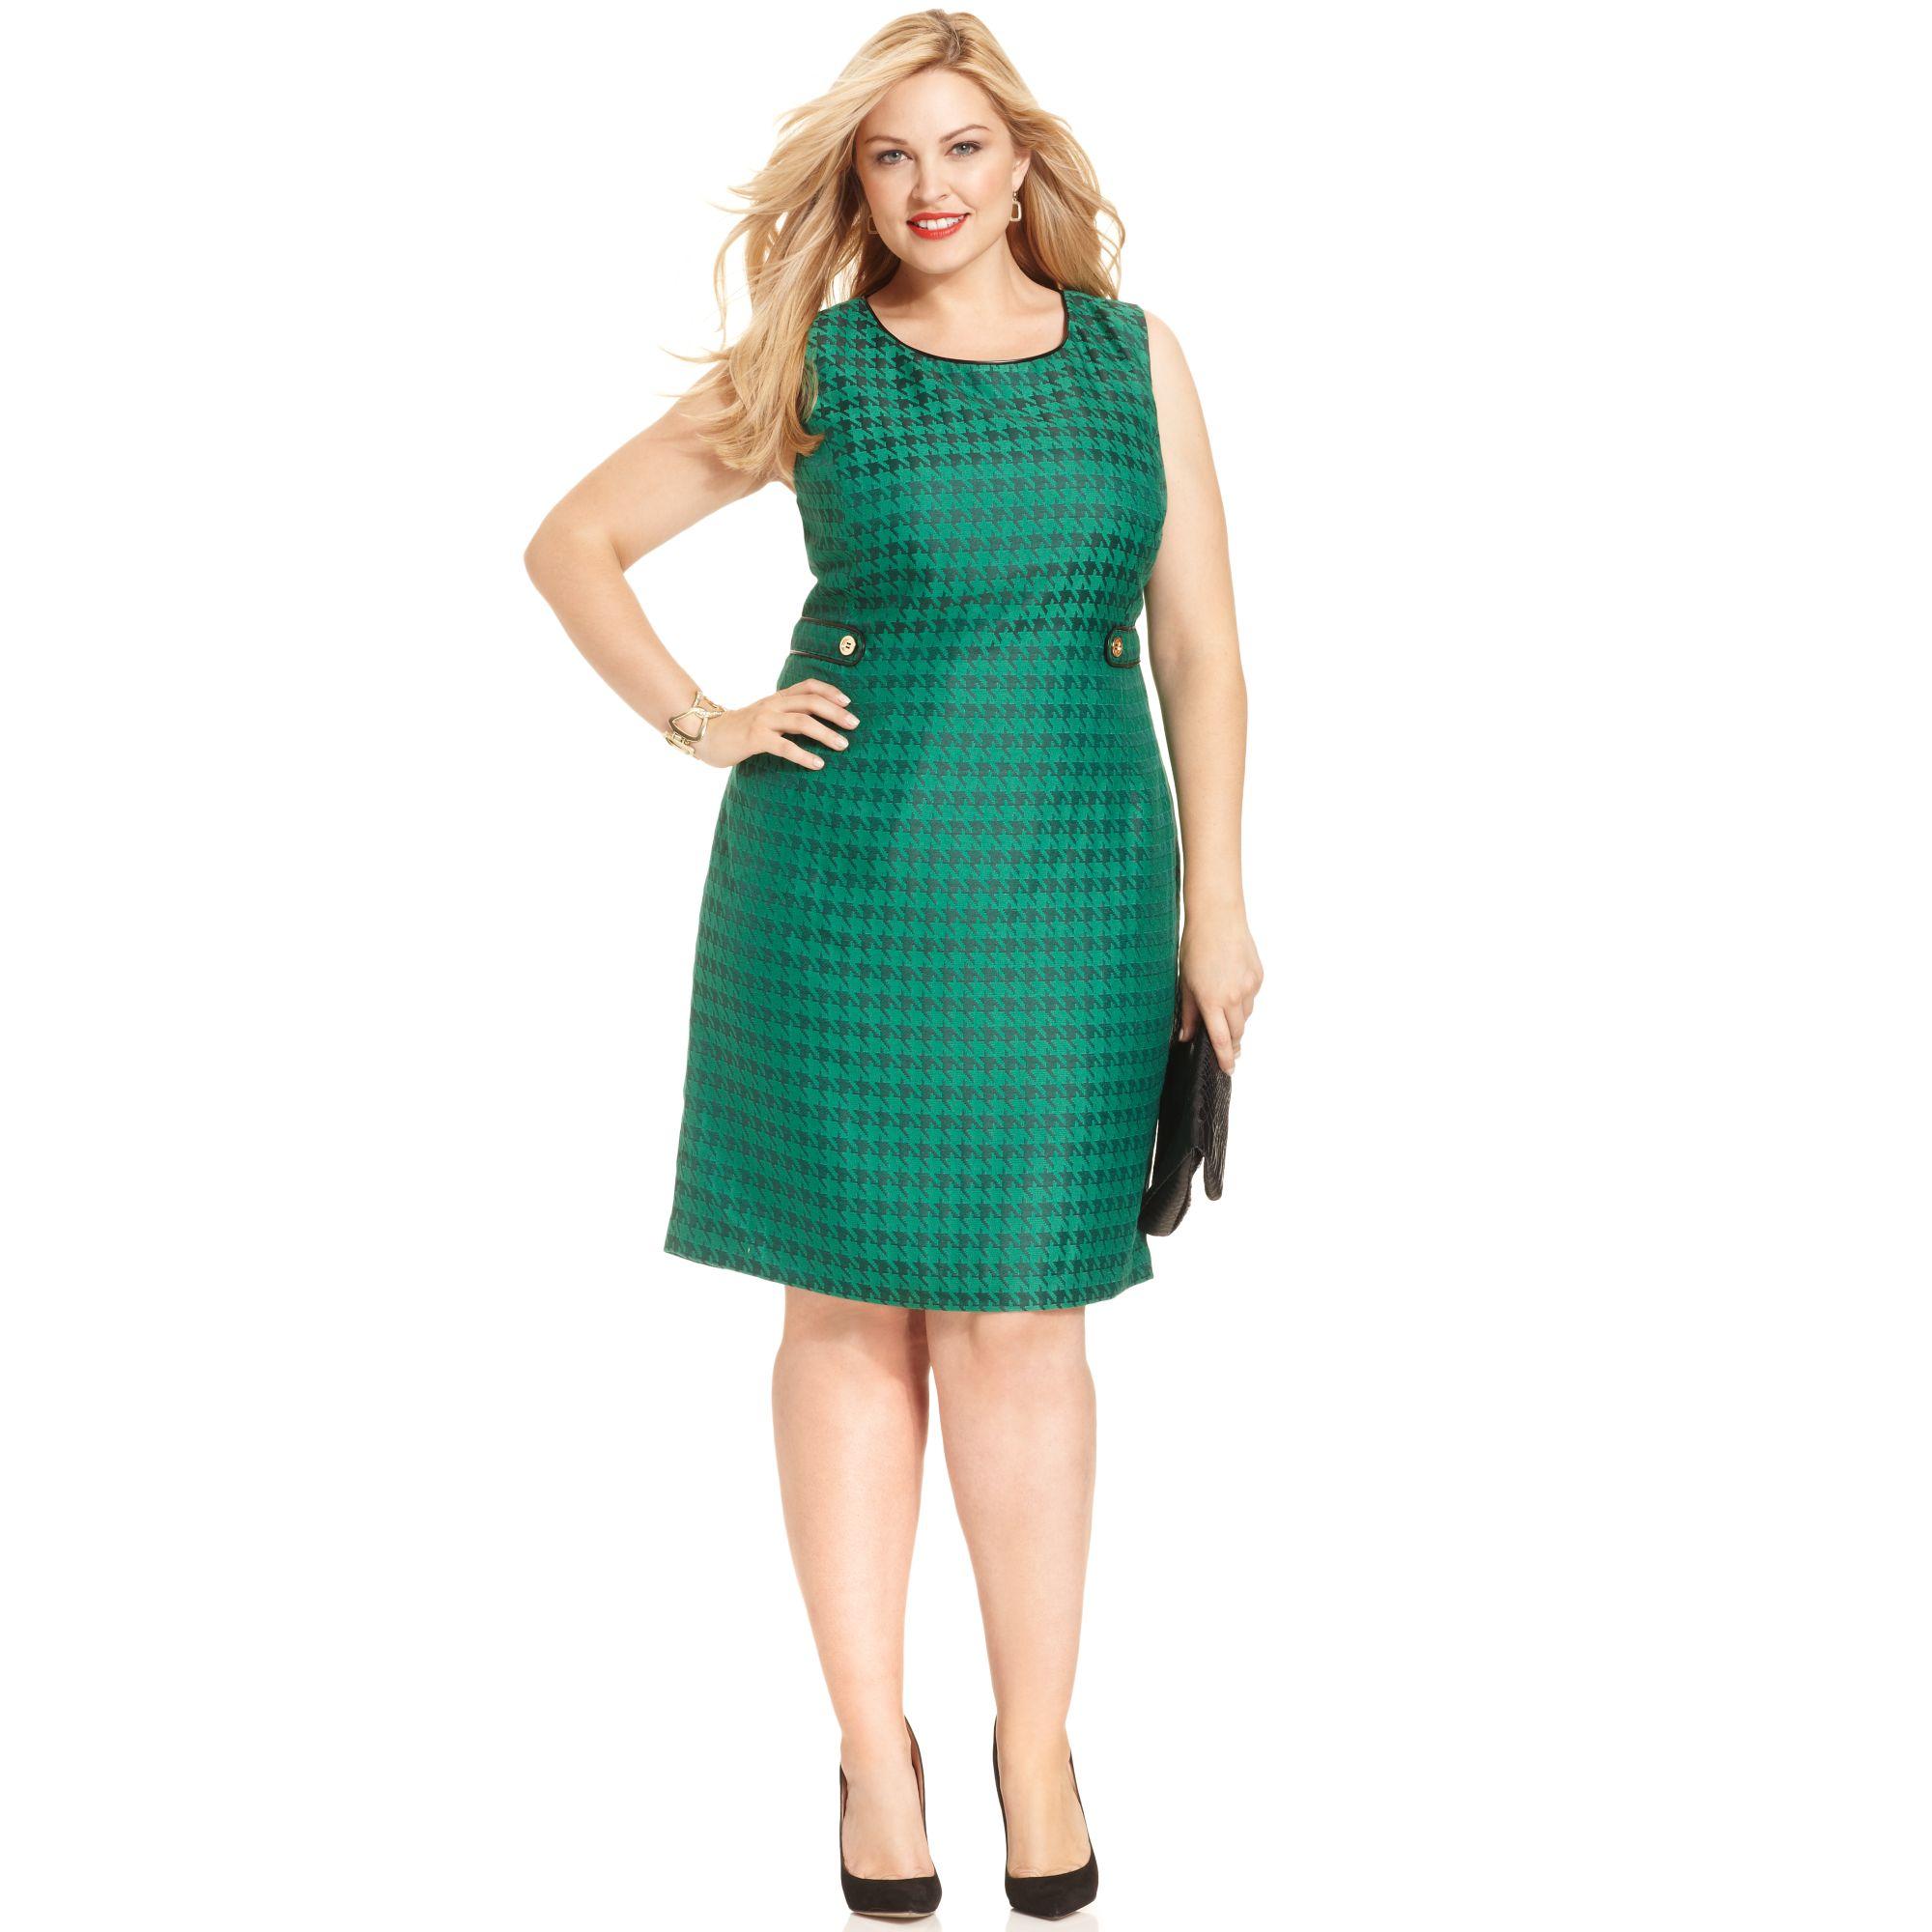 Jones New York Sleeveless Houndstooth-print Shift Dress in Green - Lyst